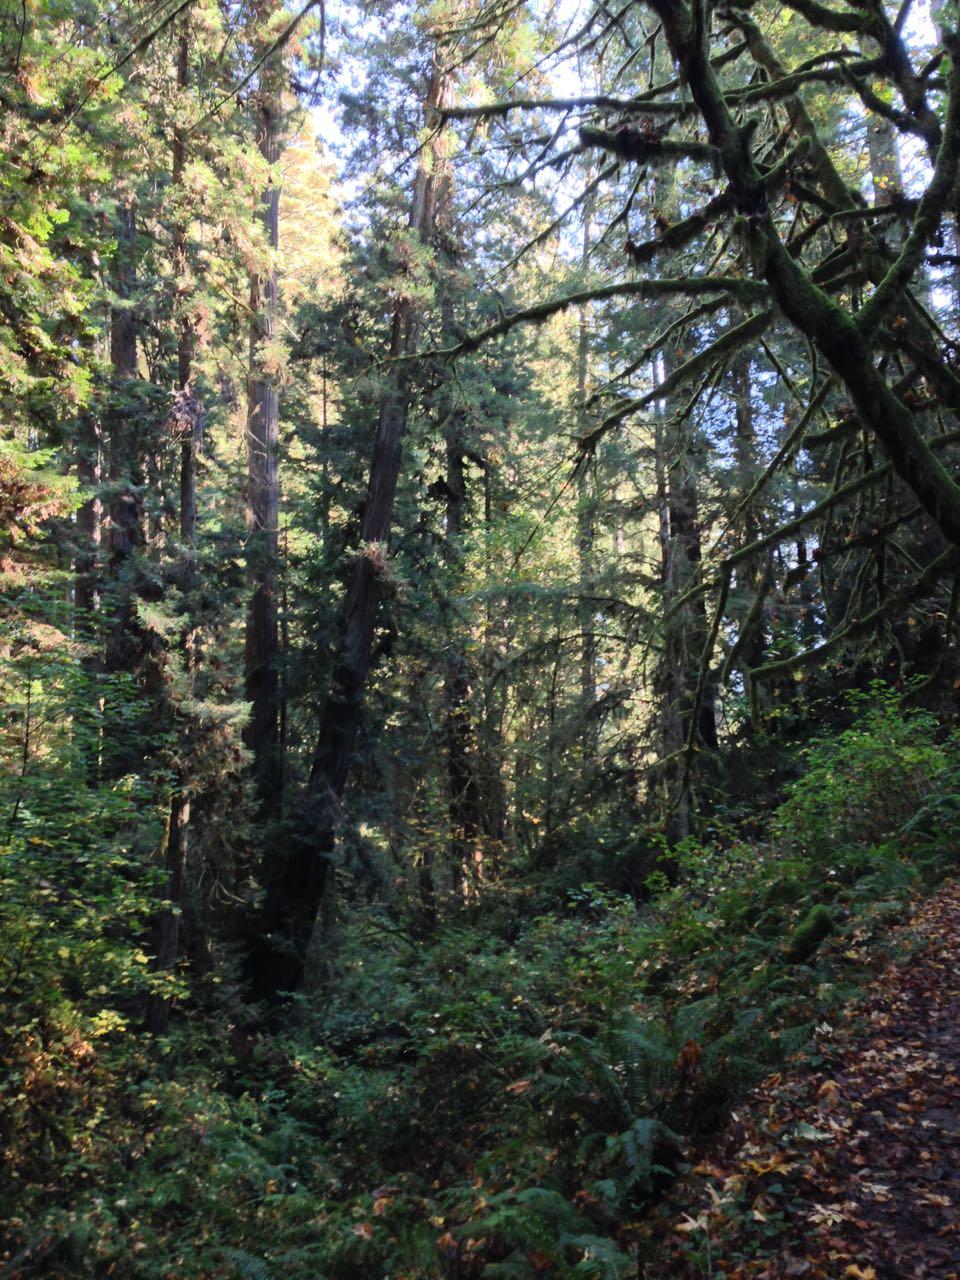 Redwoods 2017 10 08 229 Of 287